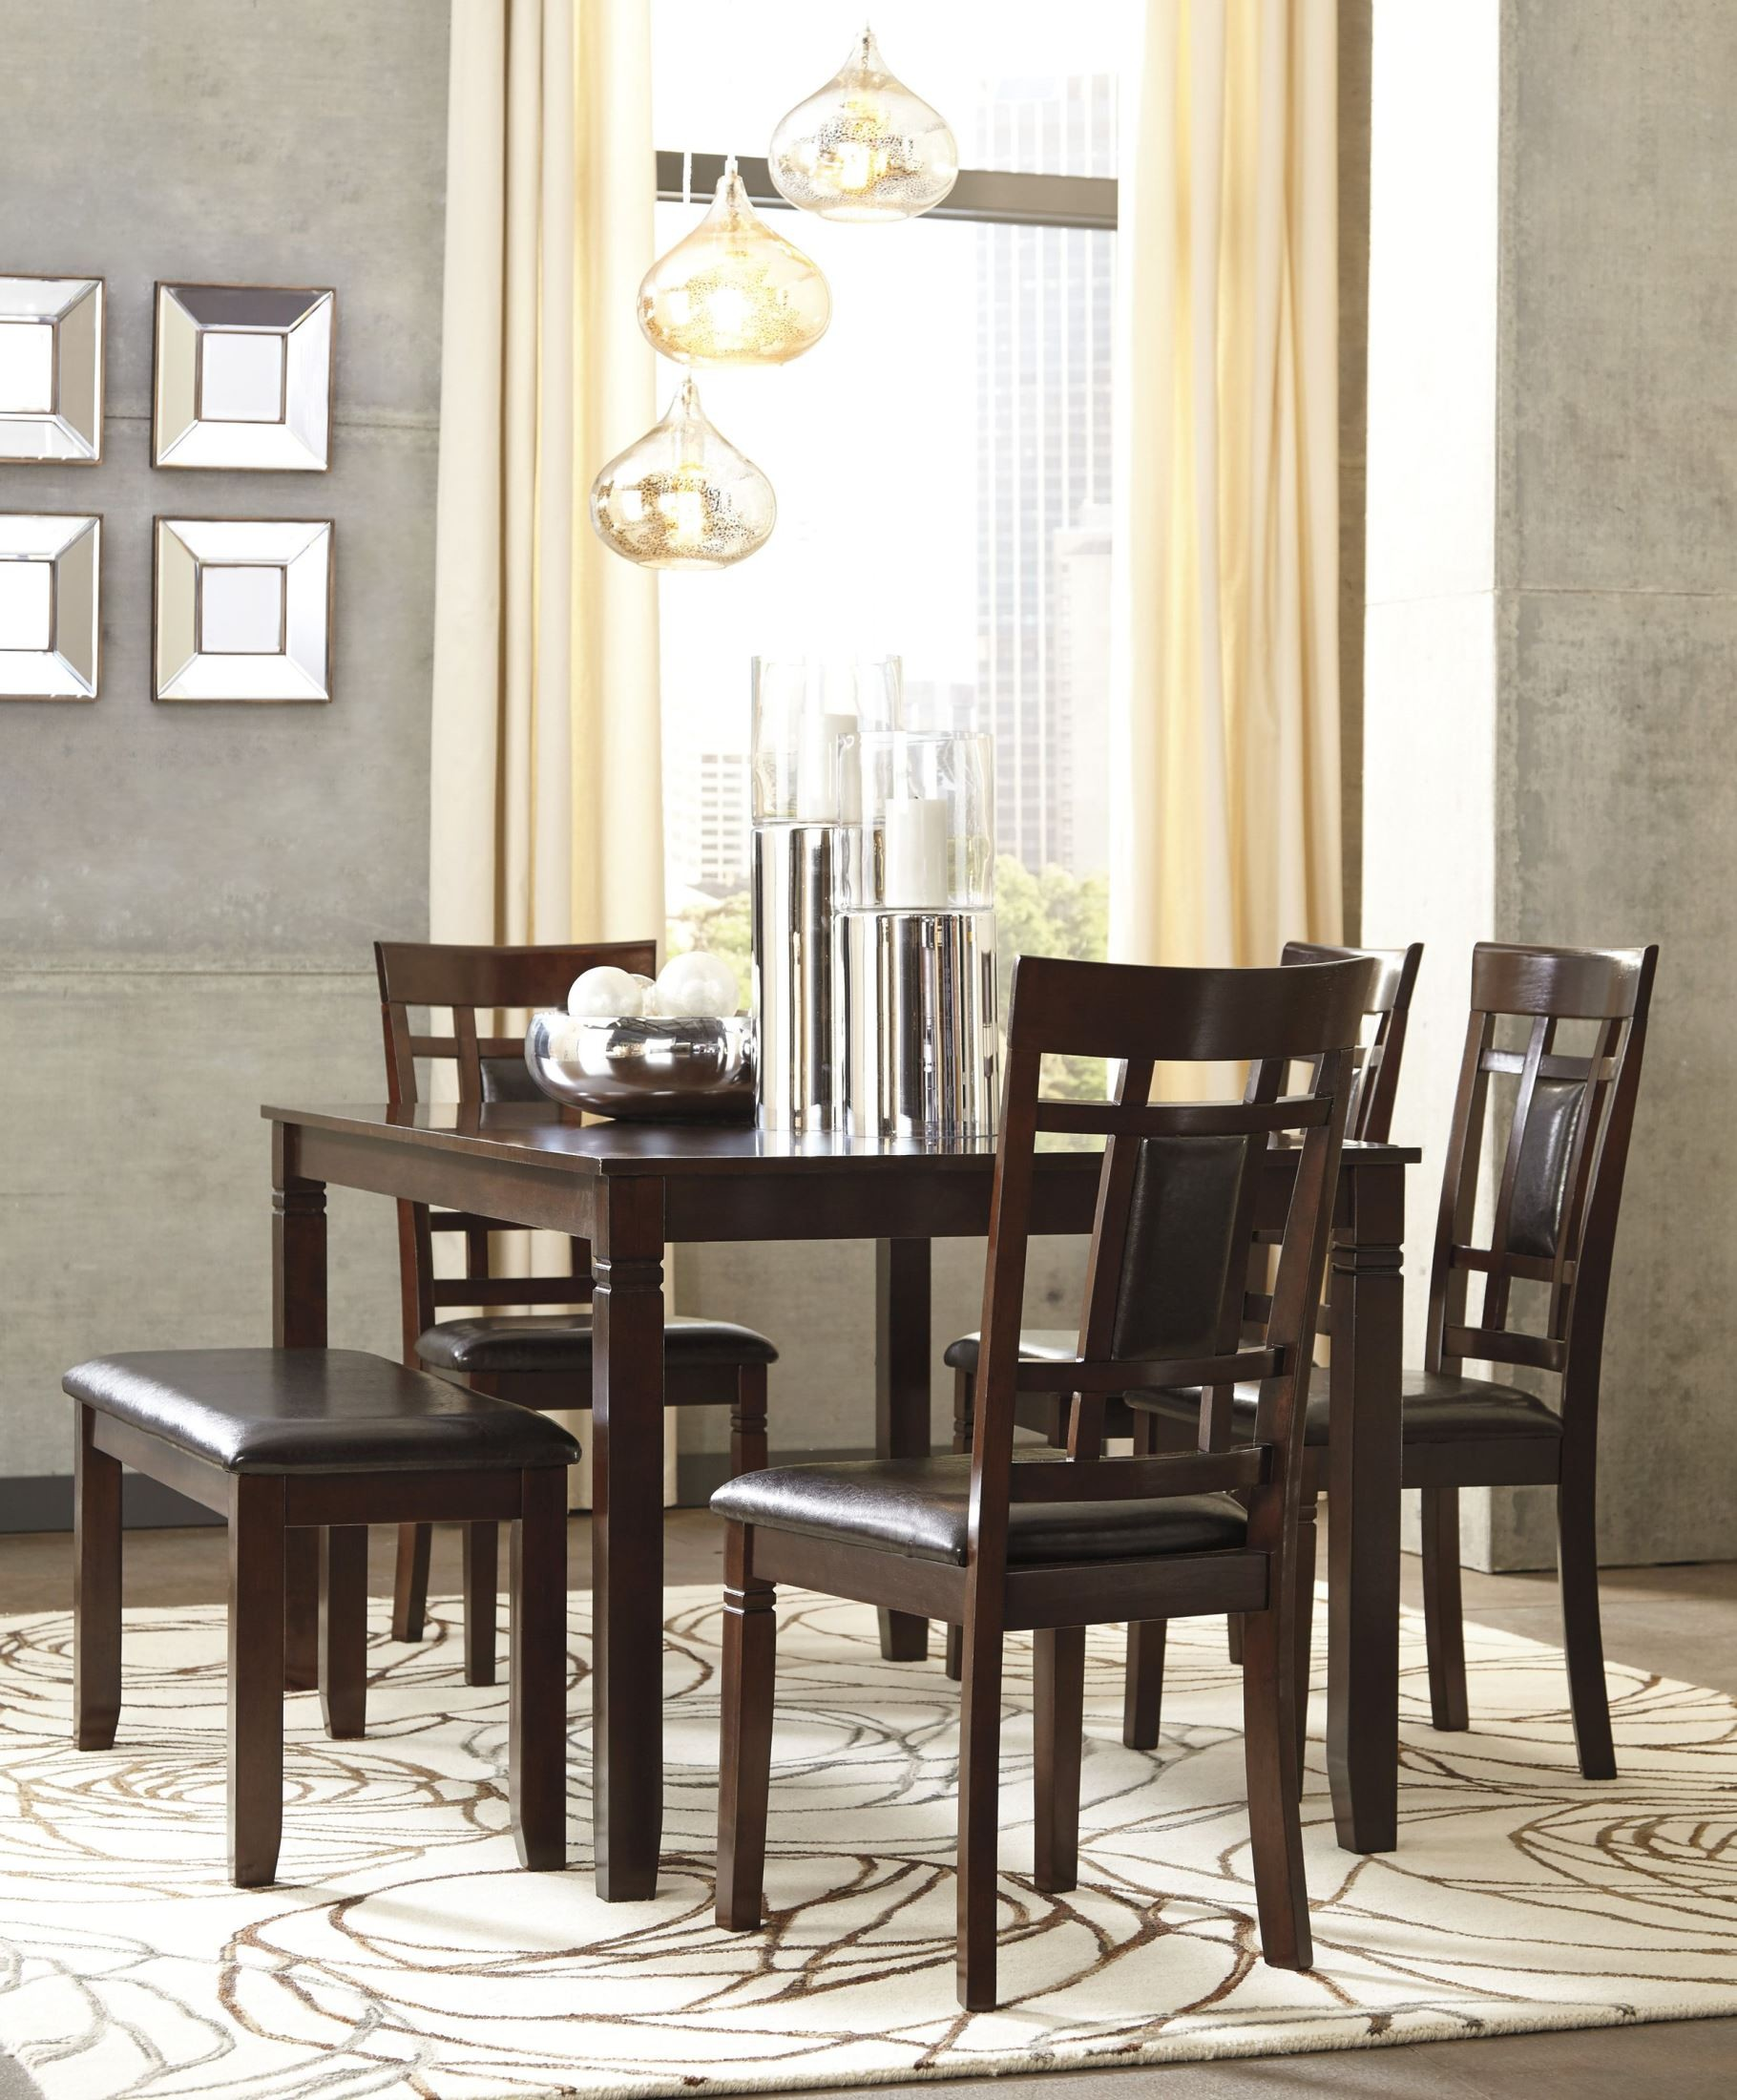 Rectangular Dinette Sets: Bennox Brown 6 Piece Rectangular Dining Room Set, D384-325